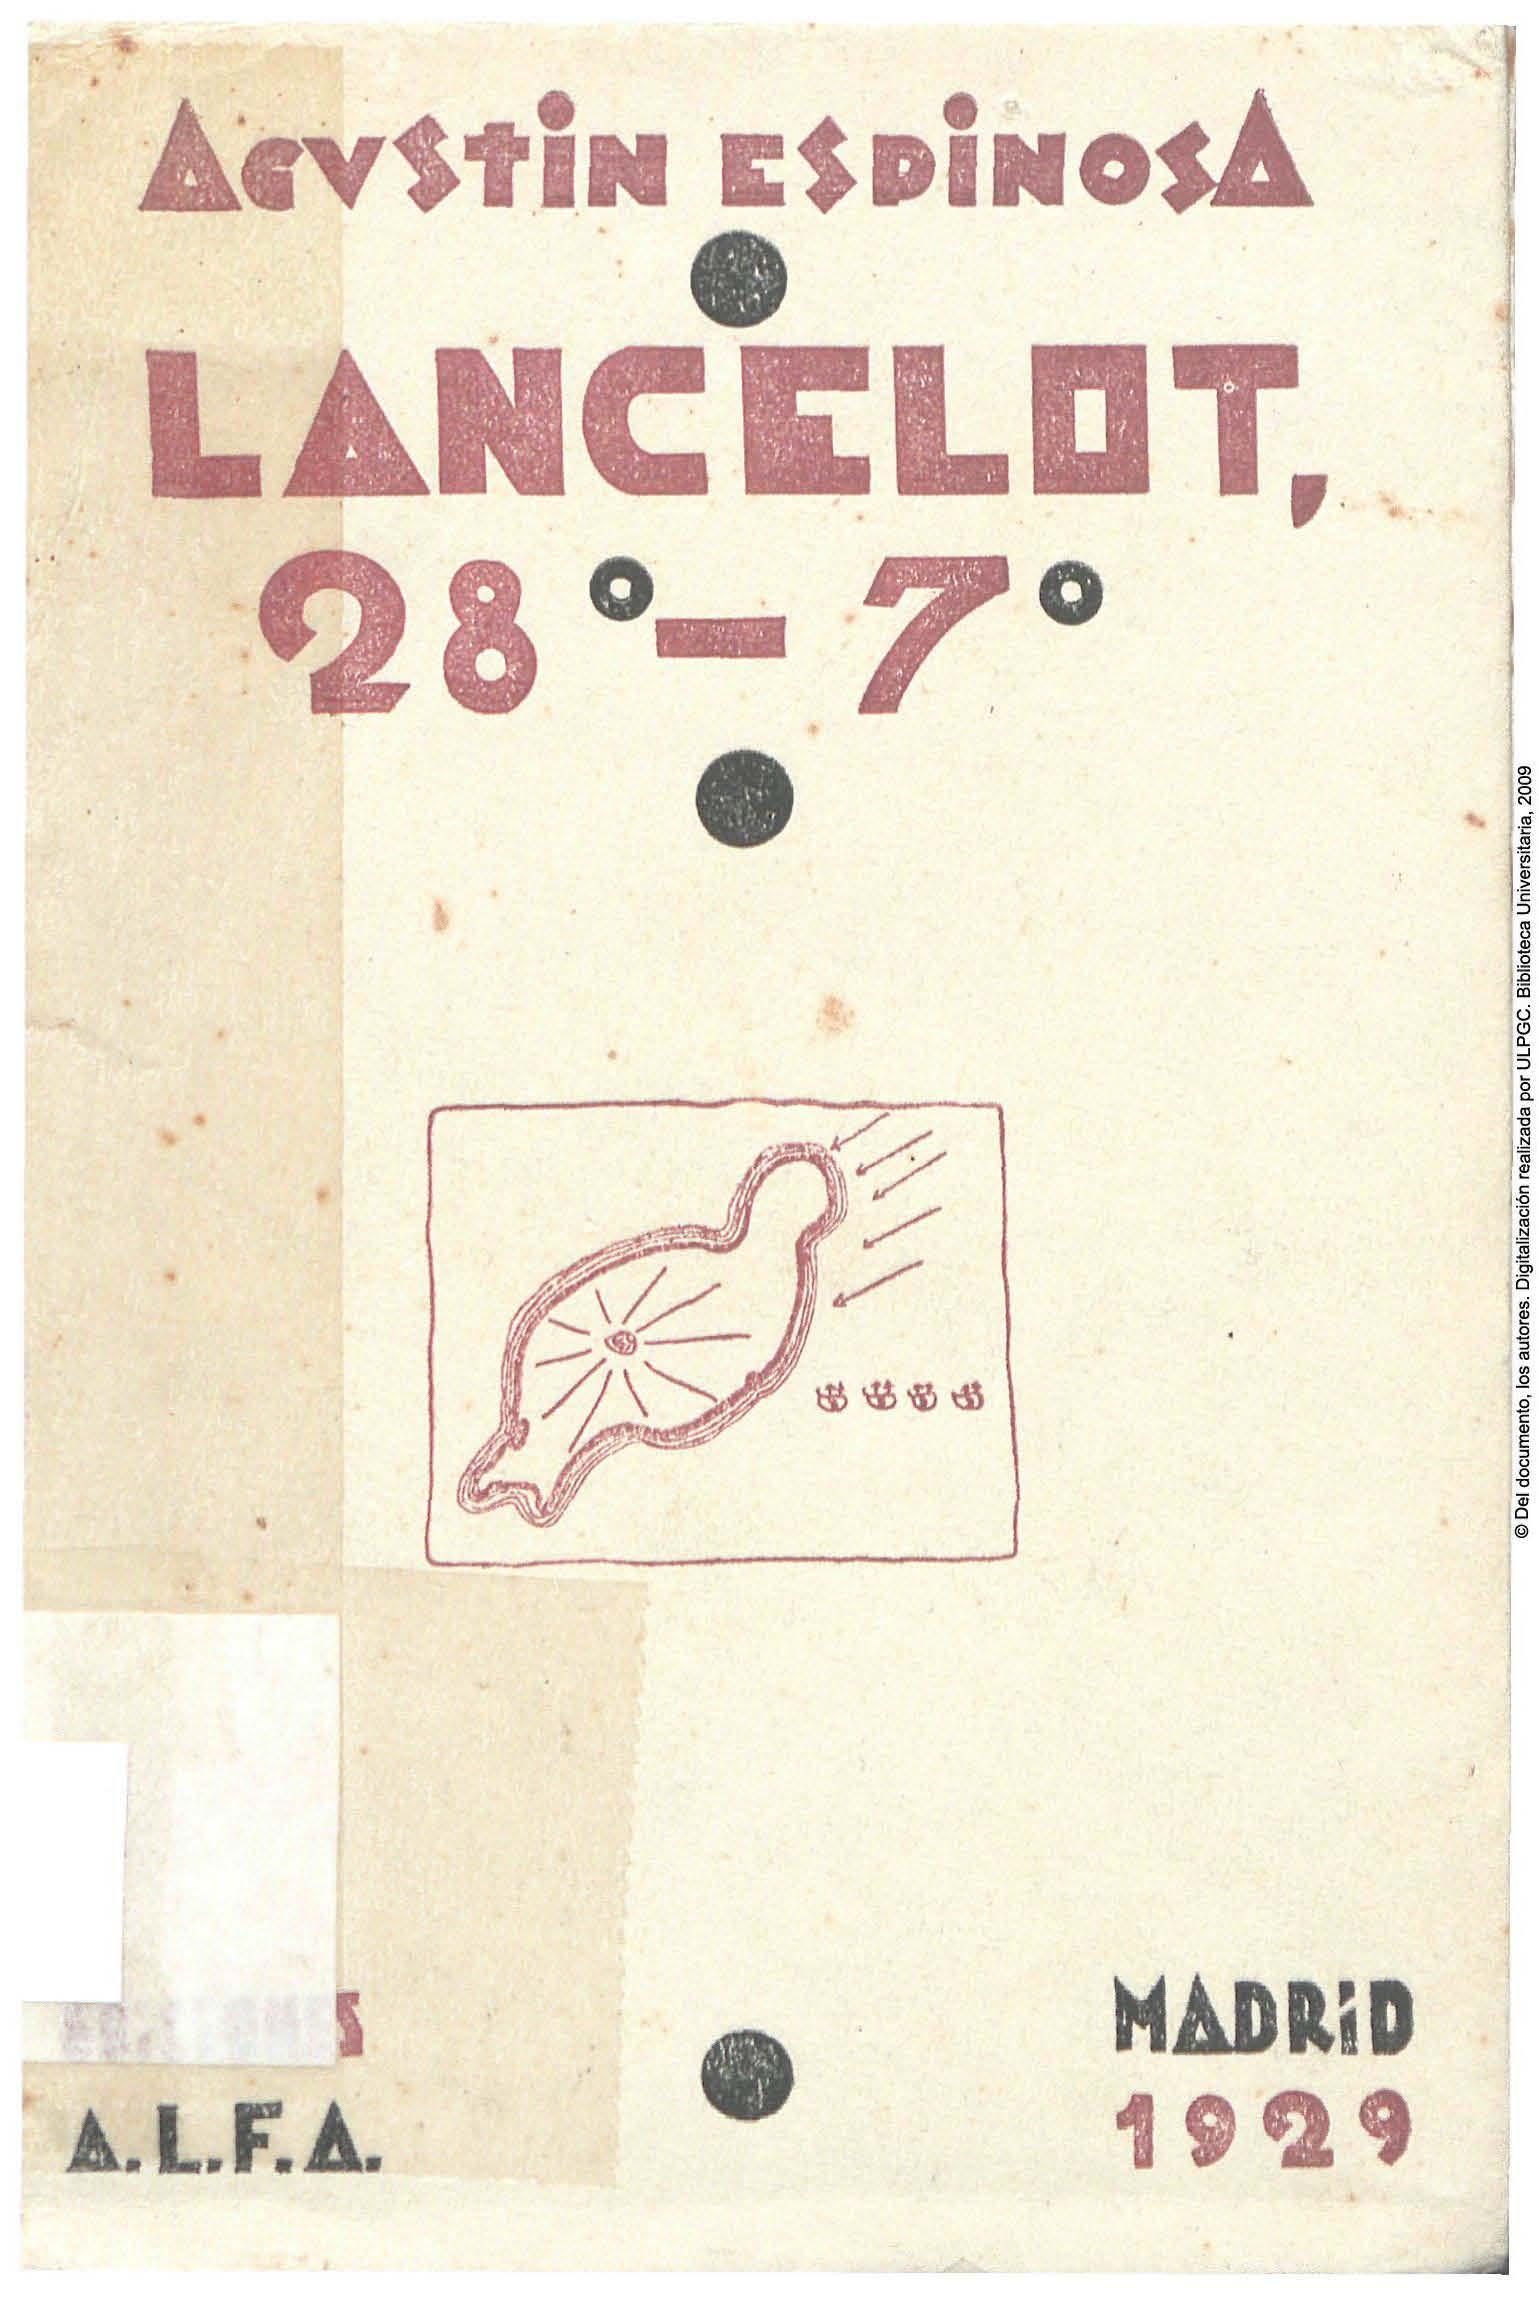 Lancelot 28º - 7º